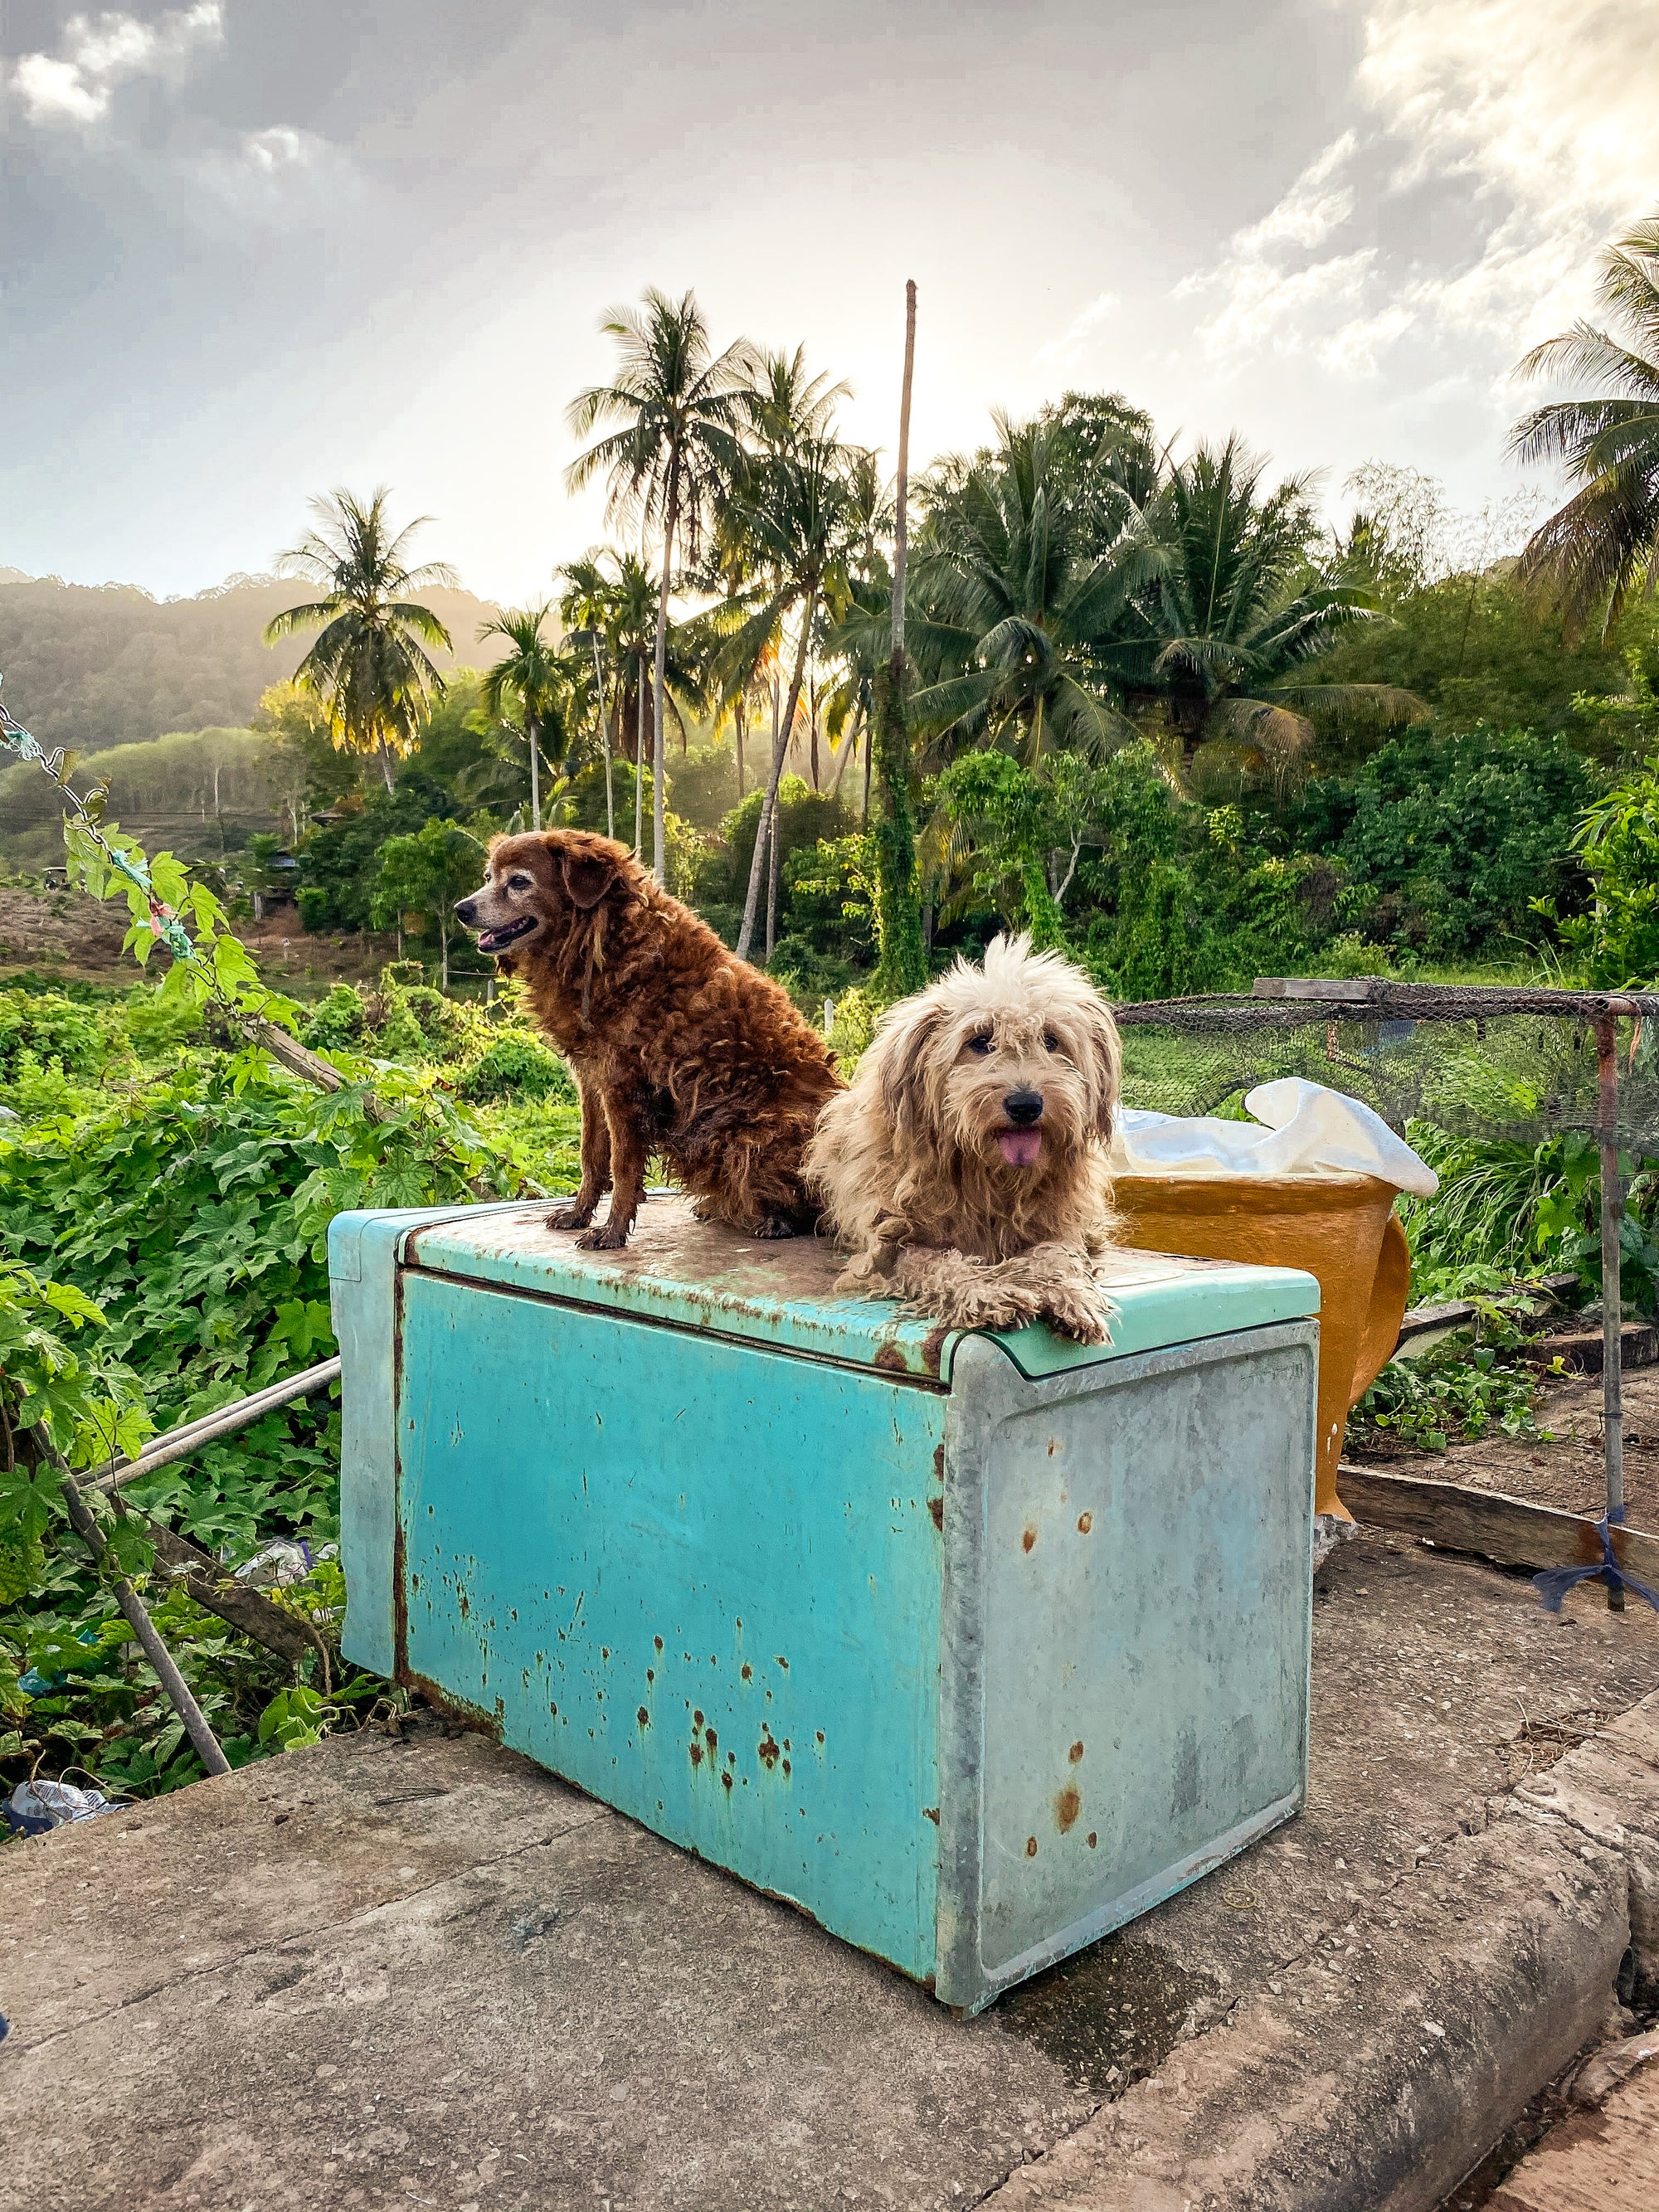 Image of Cools Dogs of Koh Lanta